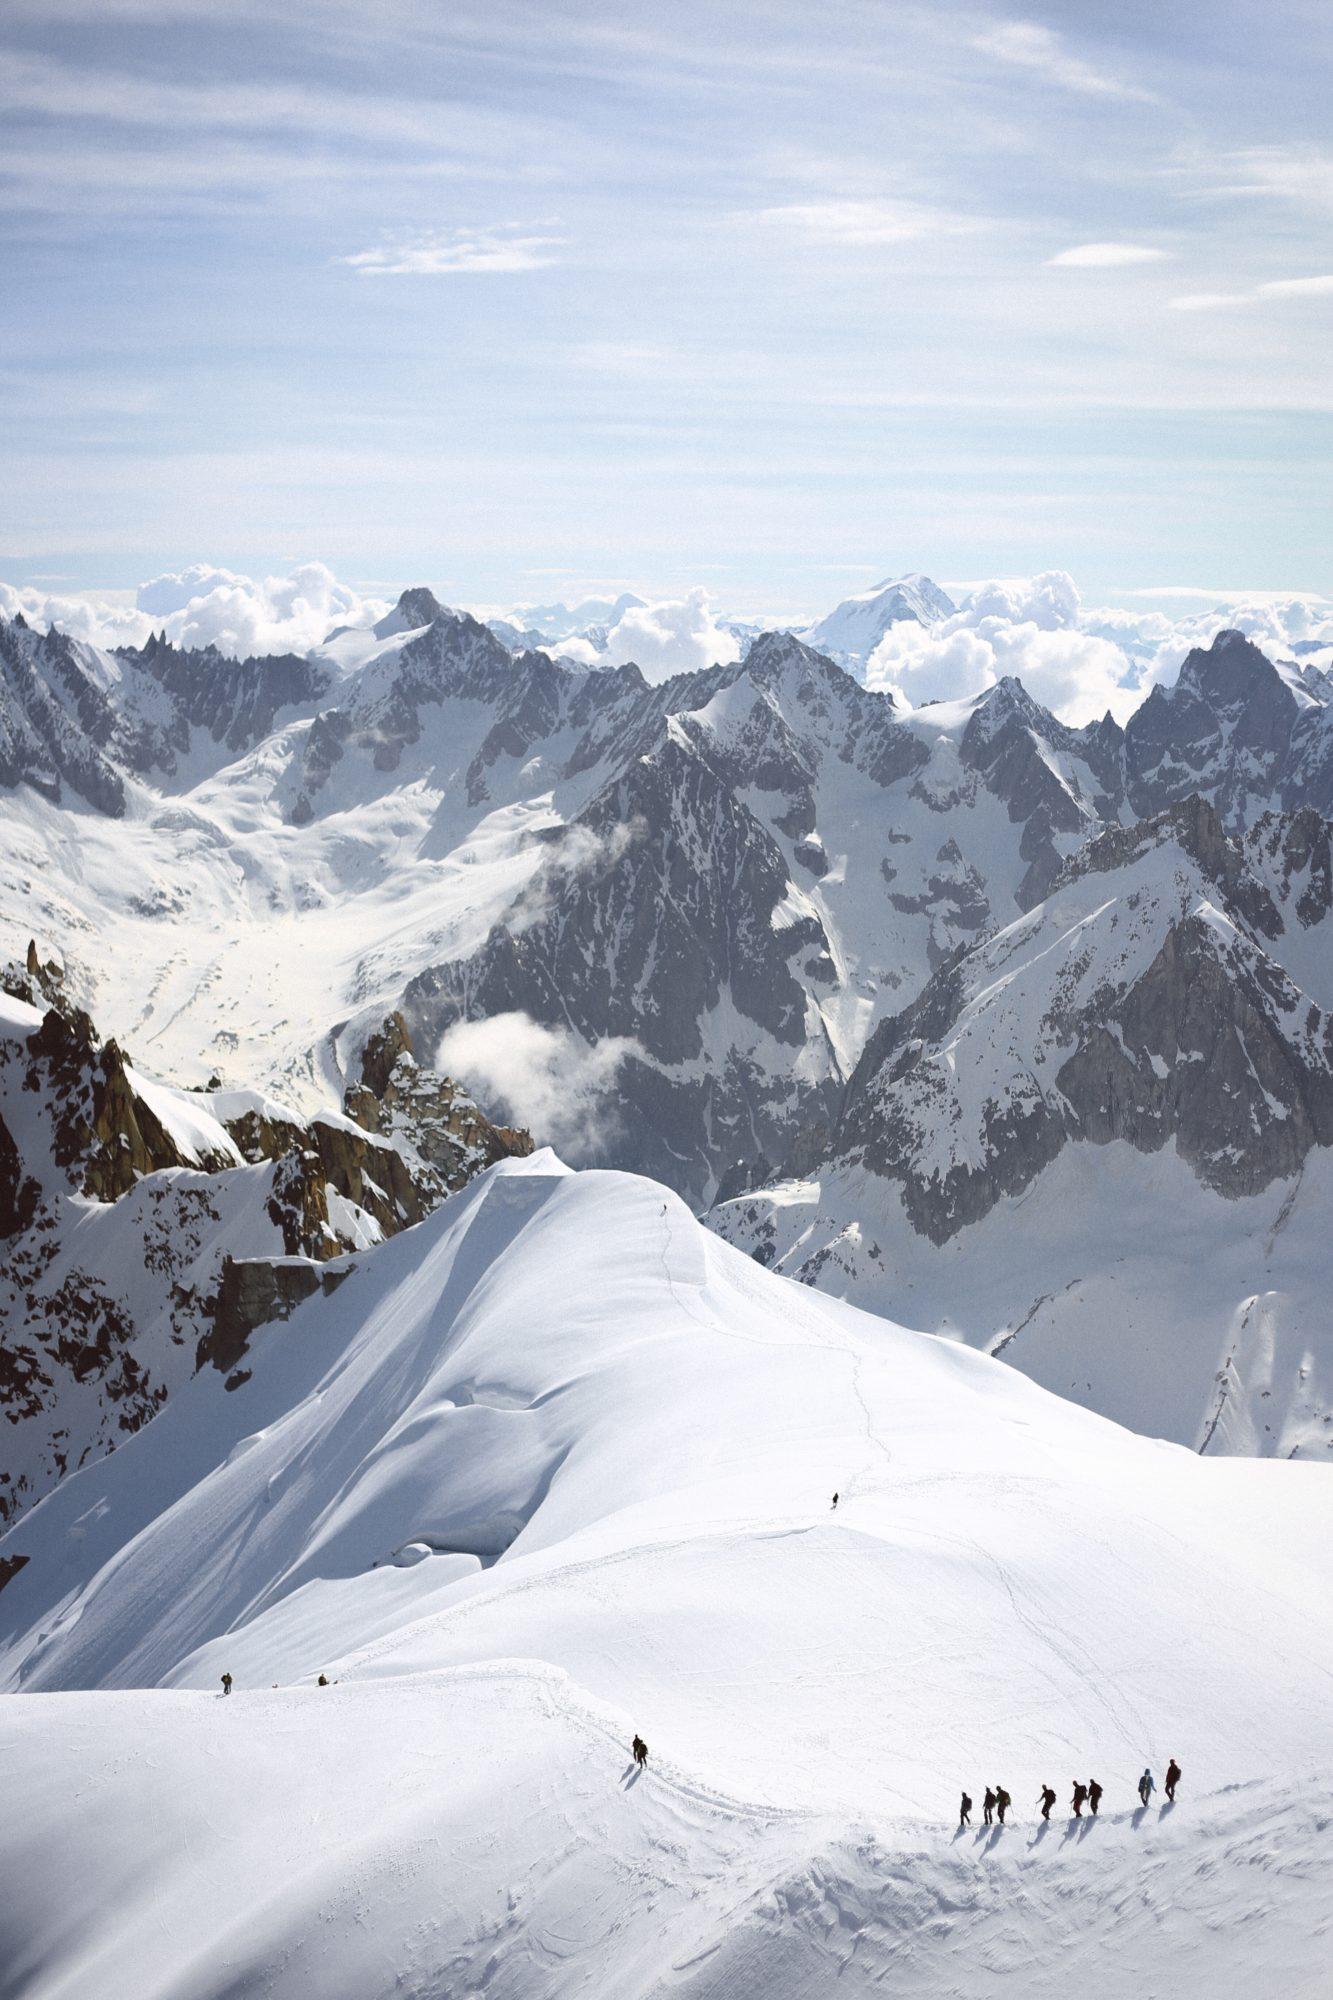 Chamonix, Best Mountain Towns In Europe